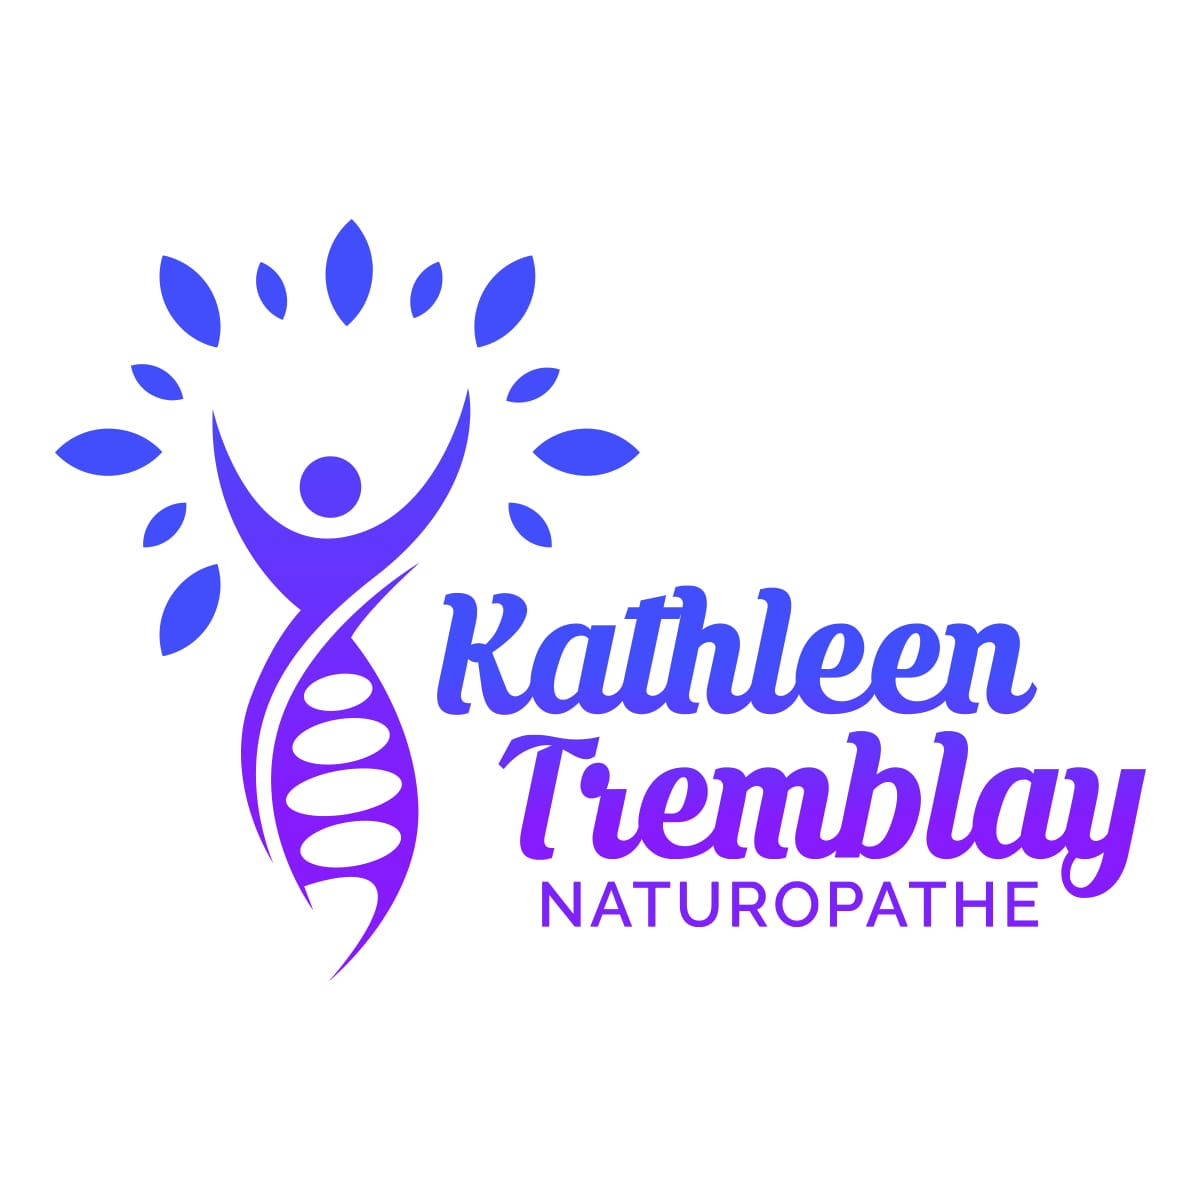 Clinique Naturopatique Kathleen Tremblay